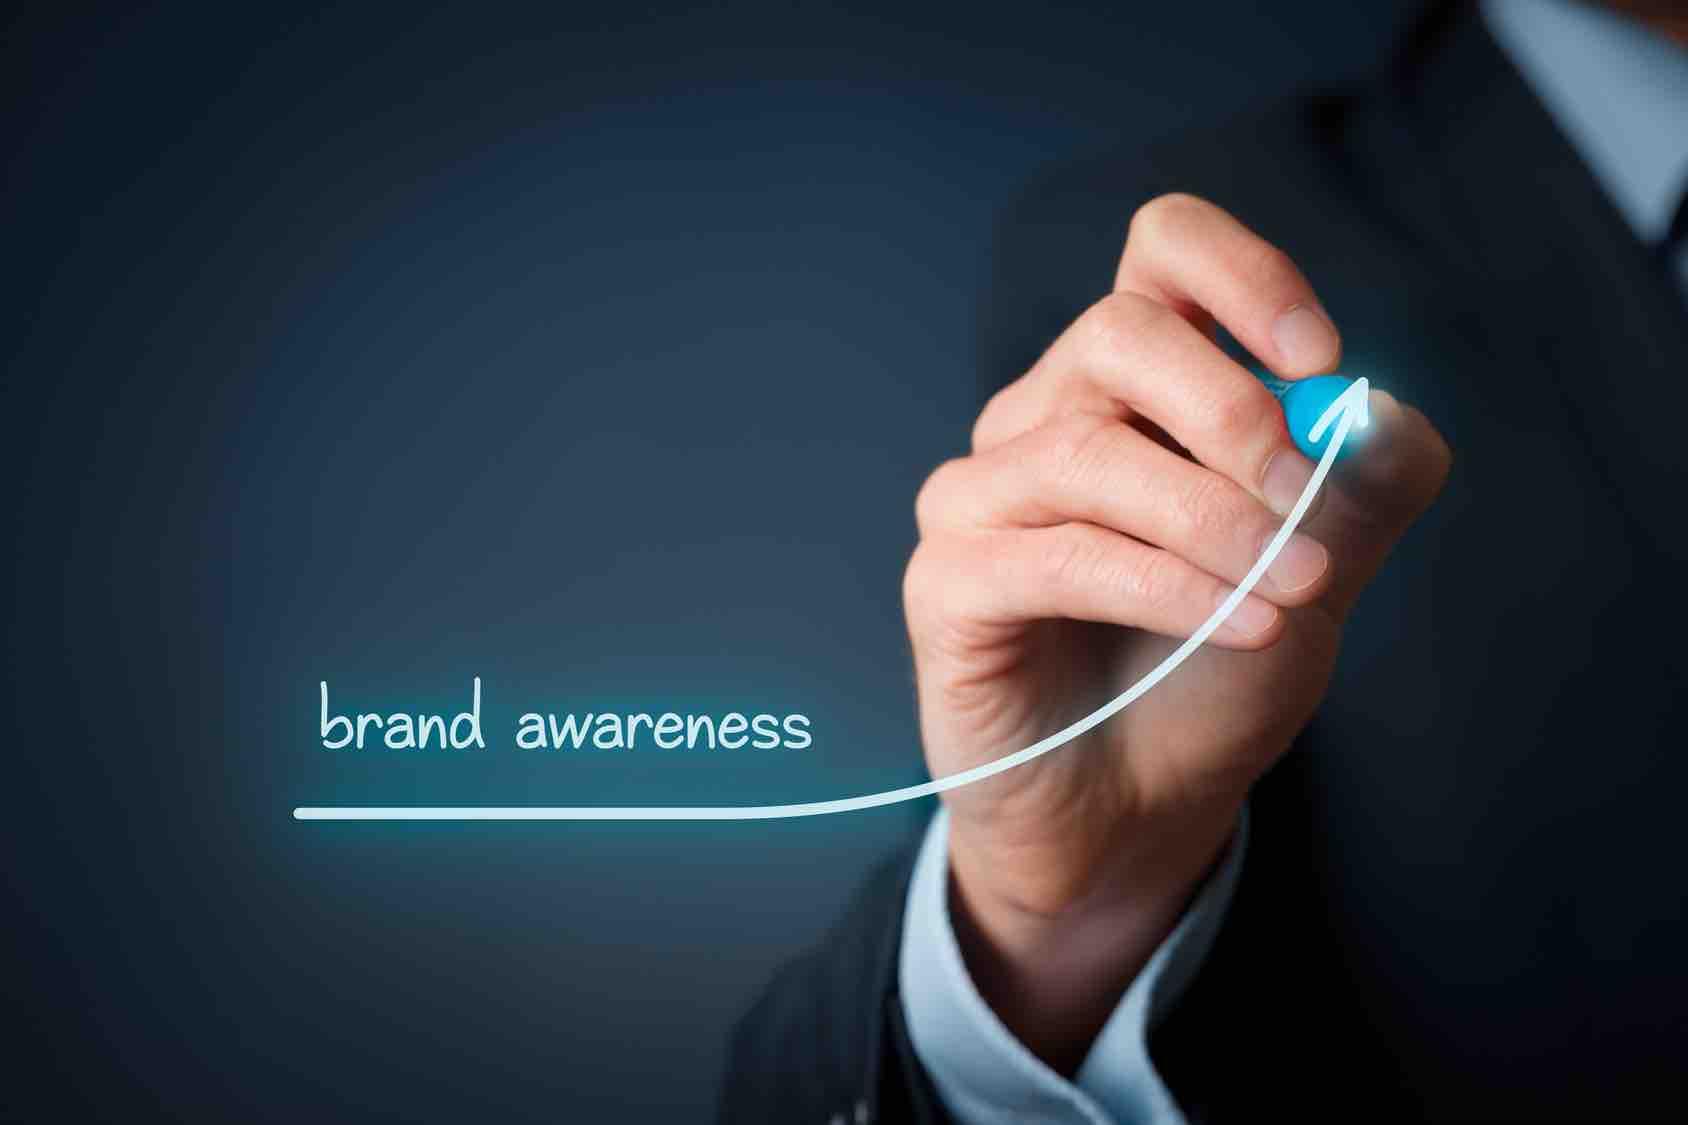 brand awareness su Instagram